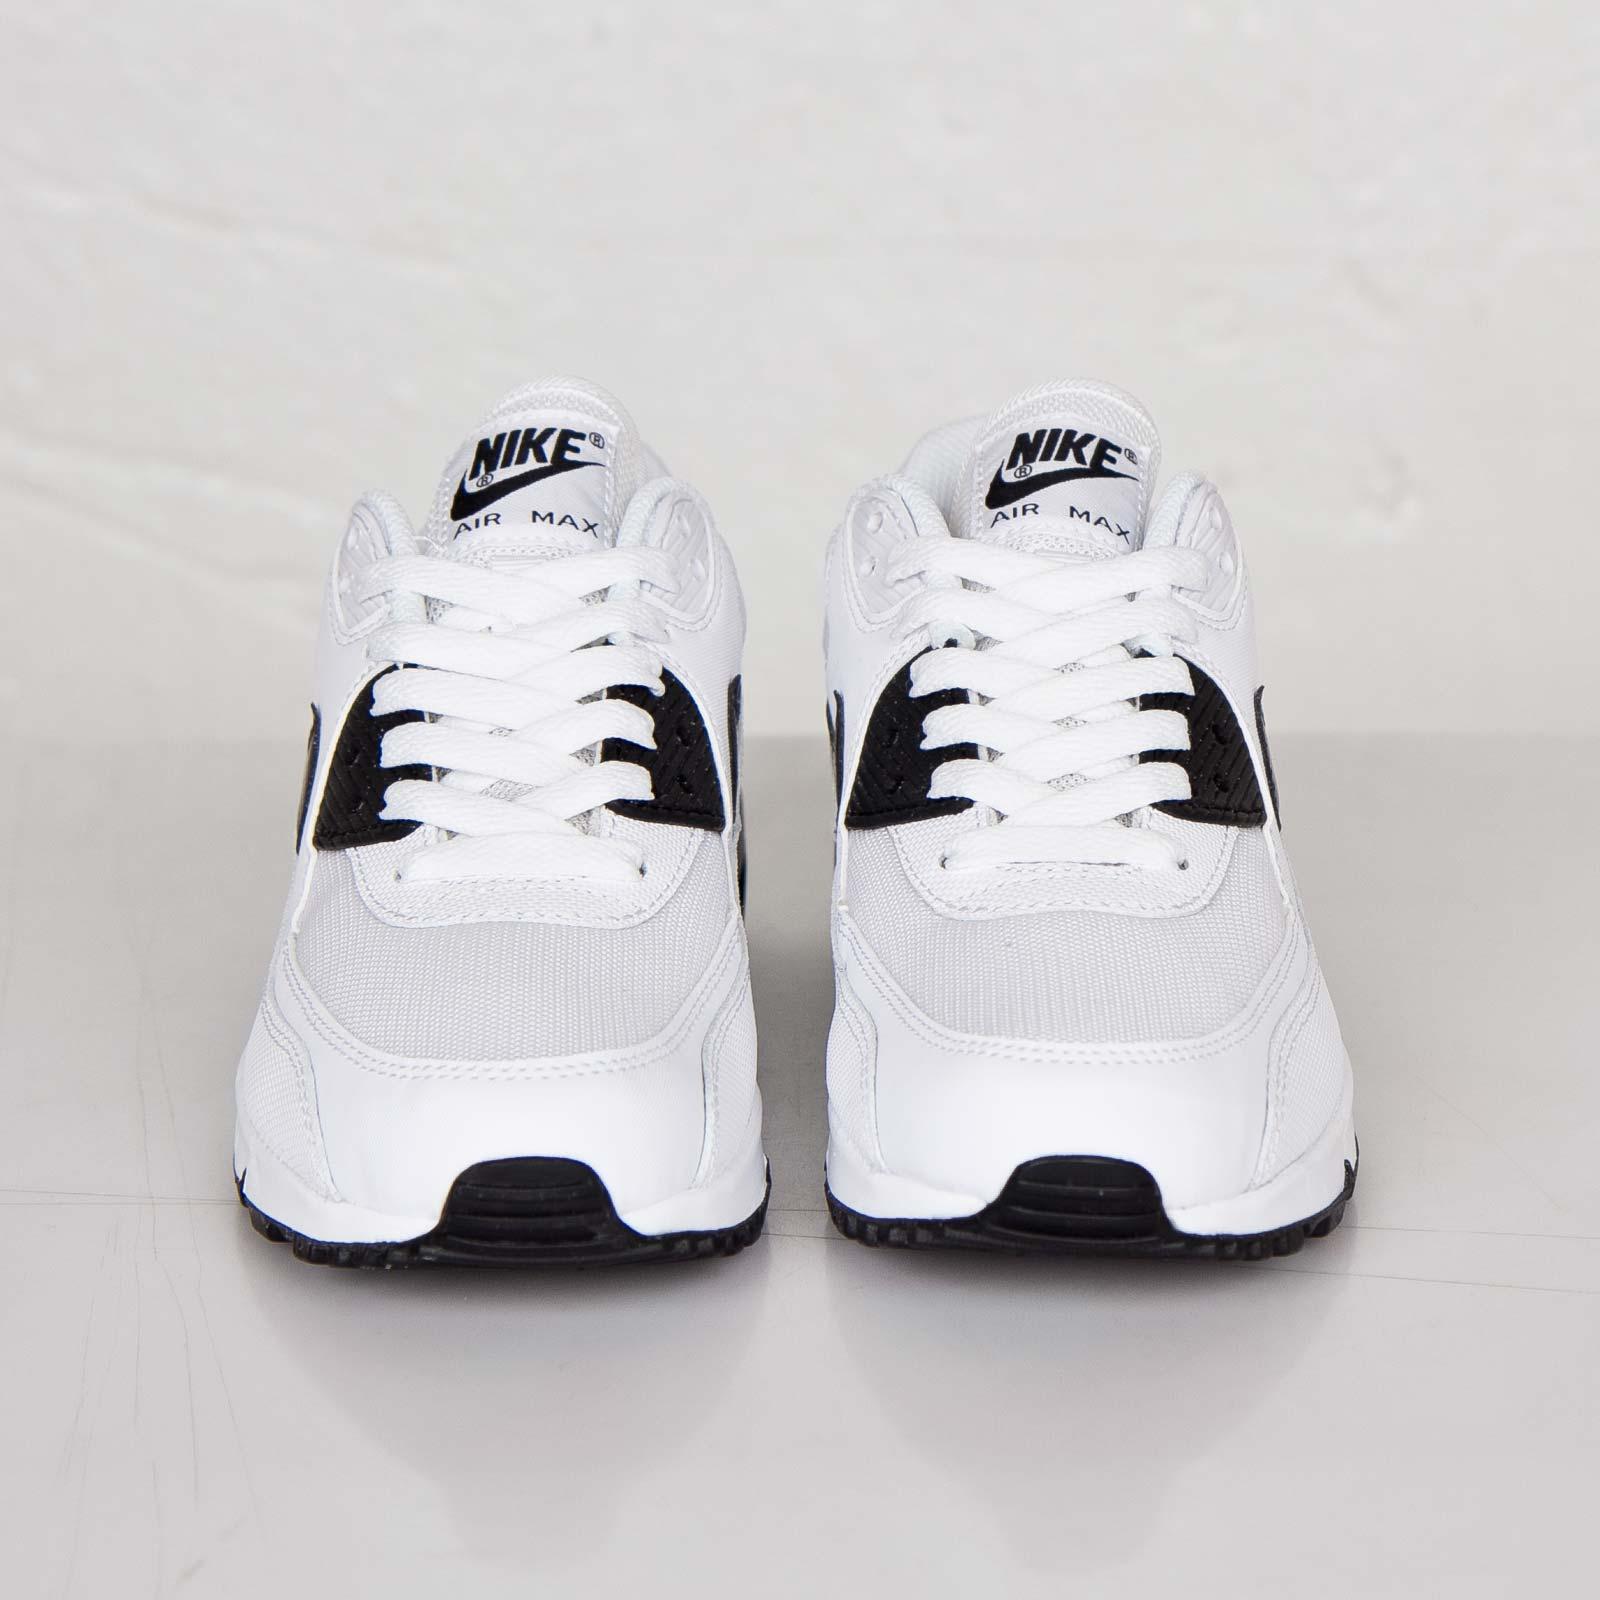 finest selection b0512 03108 Nike Wmns Air Max 90 Essential - 616730-110 - Sneakersnstuff   sneakers    streetwear på nätet sen 1999